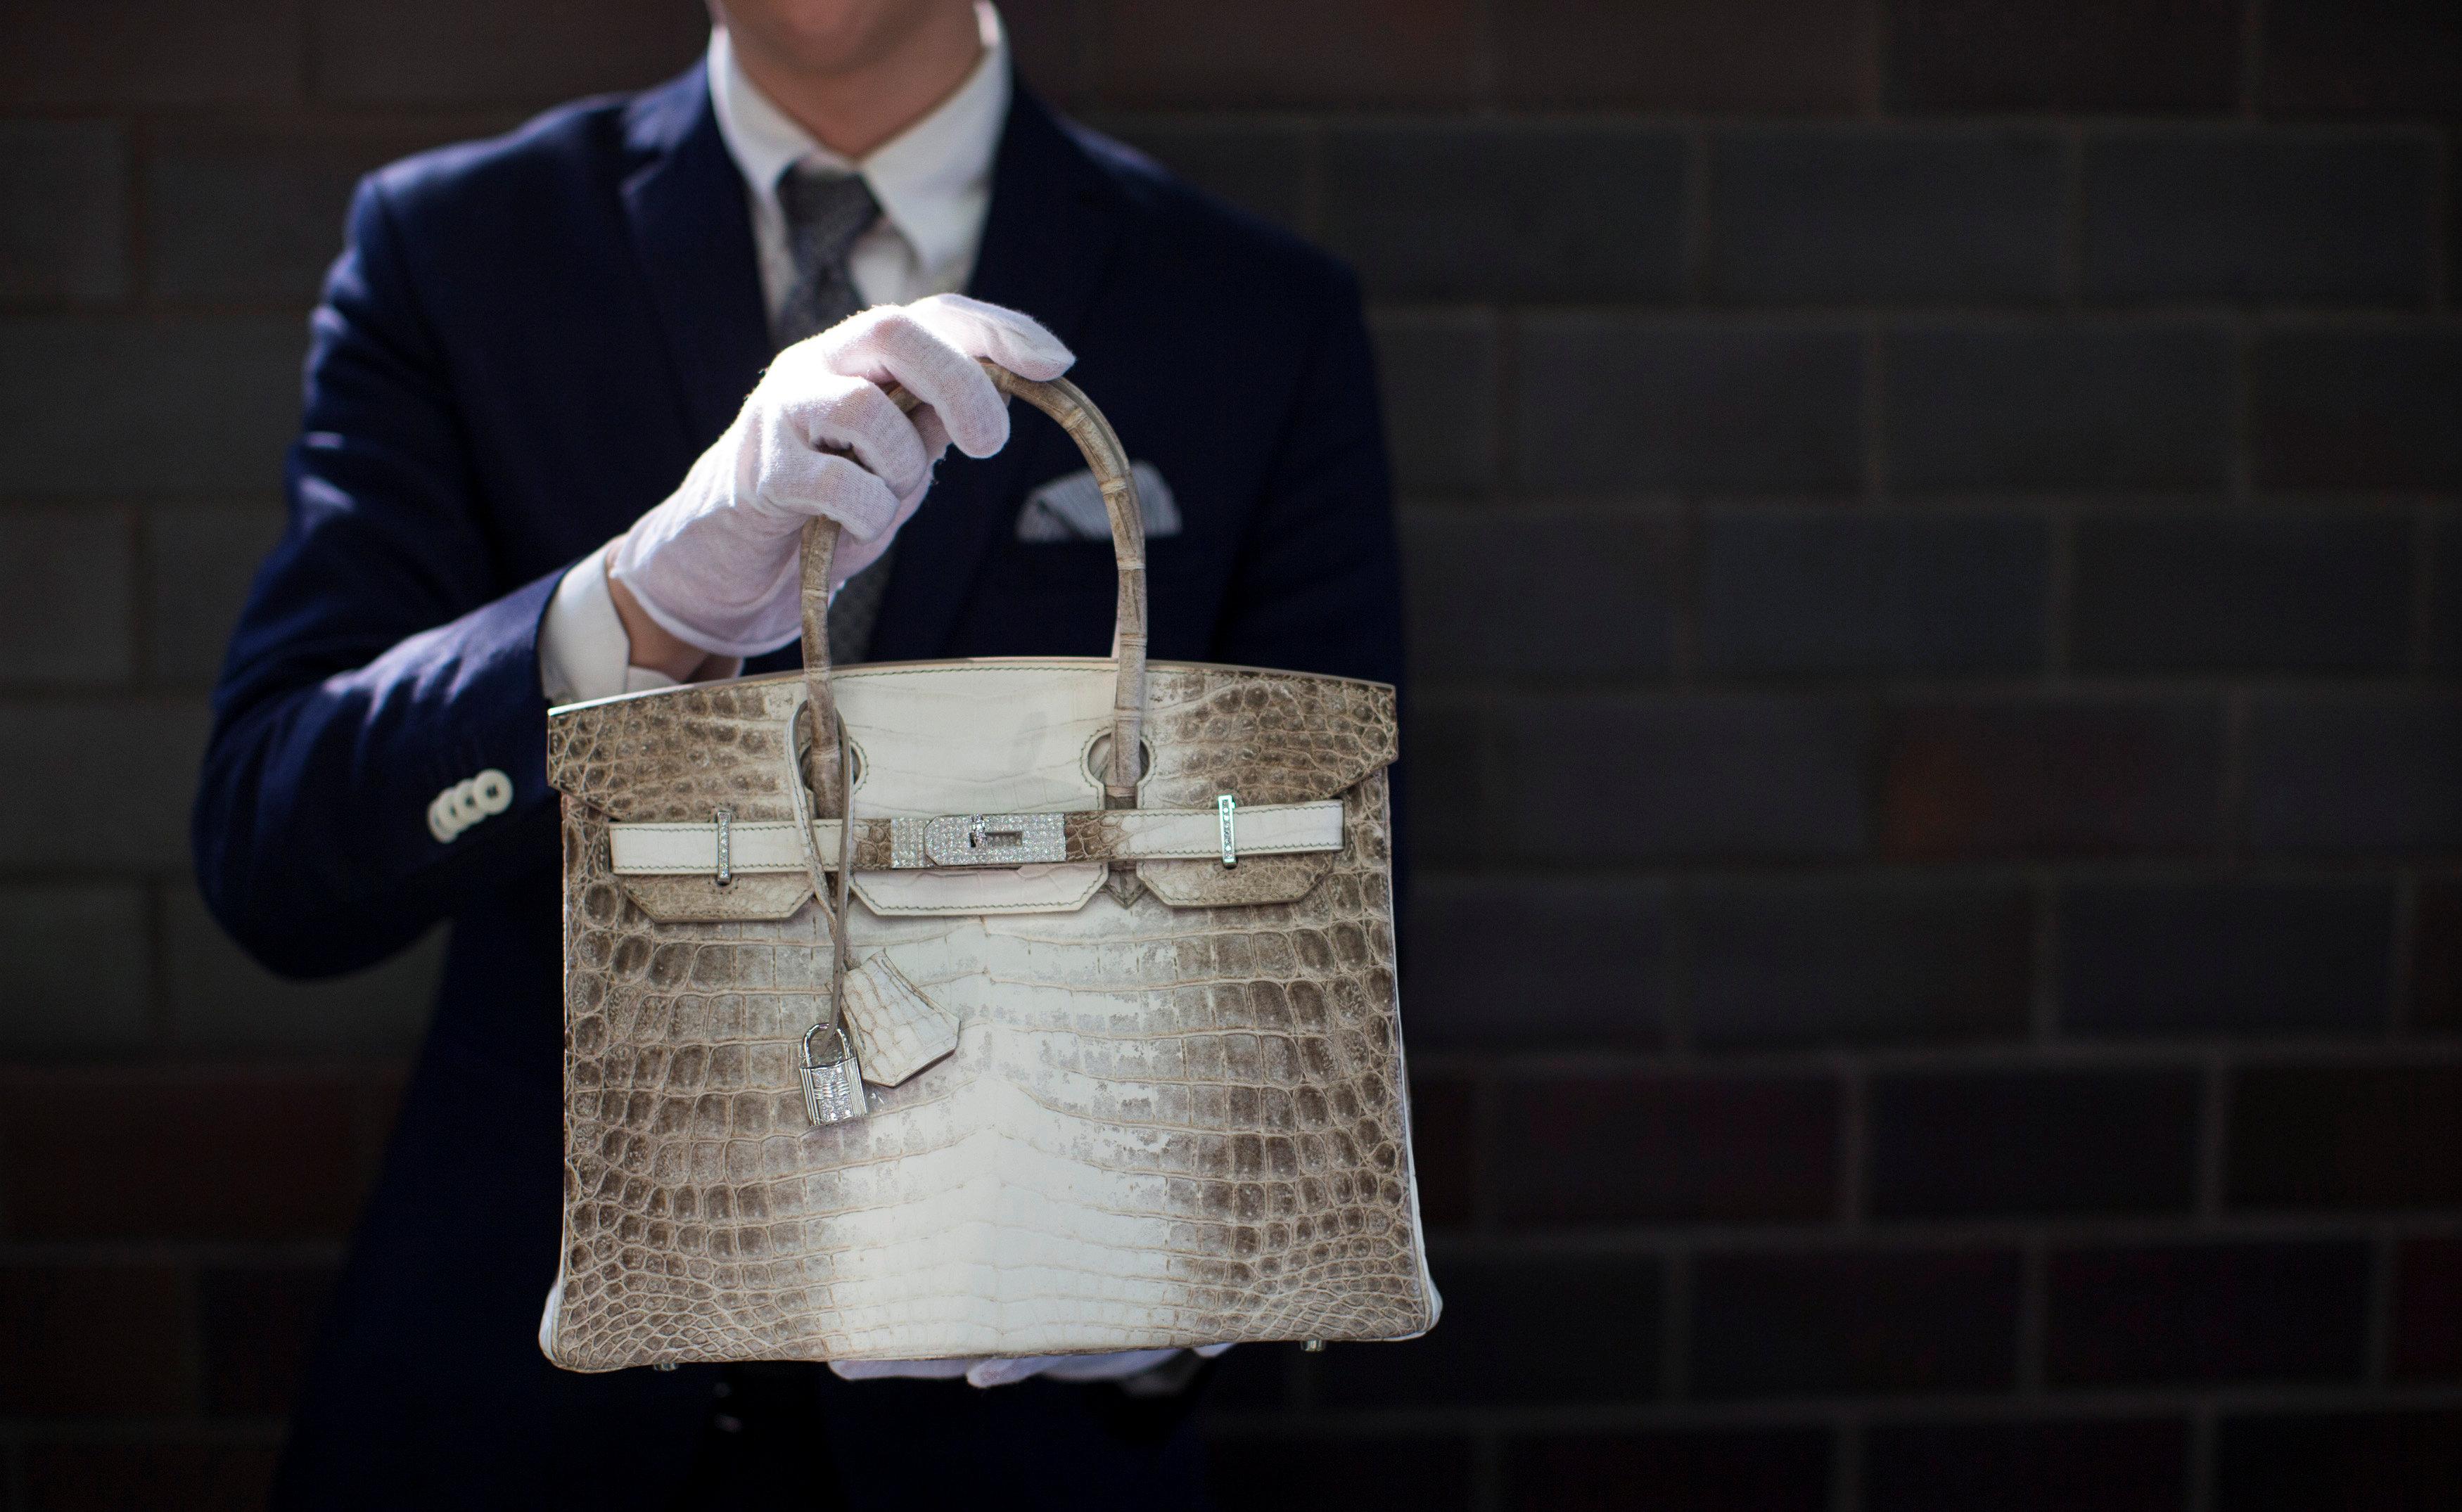 daa9b73c7101 The history behind the iconic Hermes Birkin bag